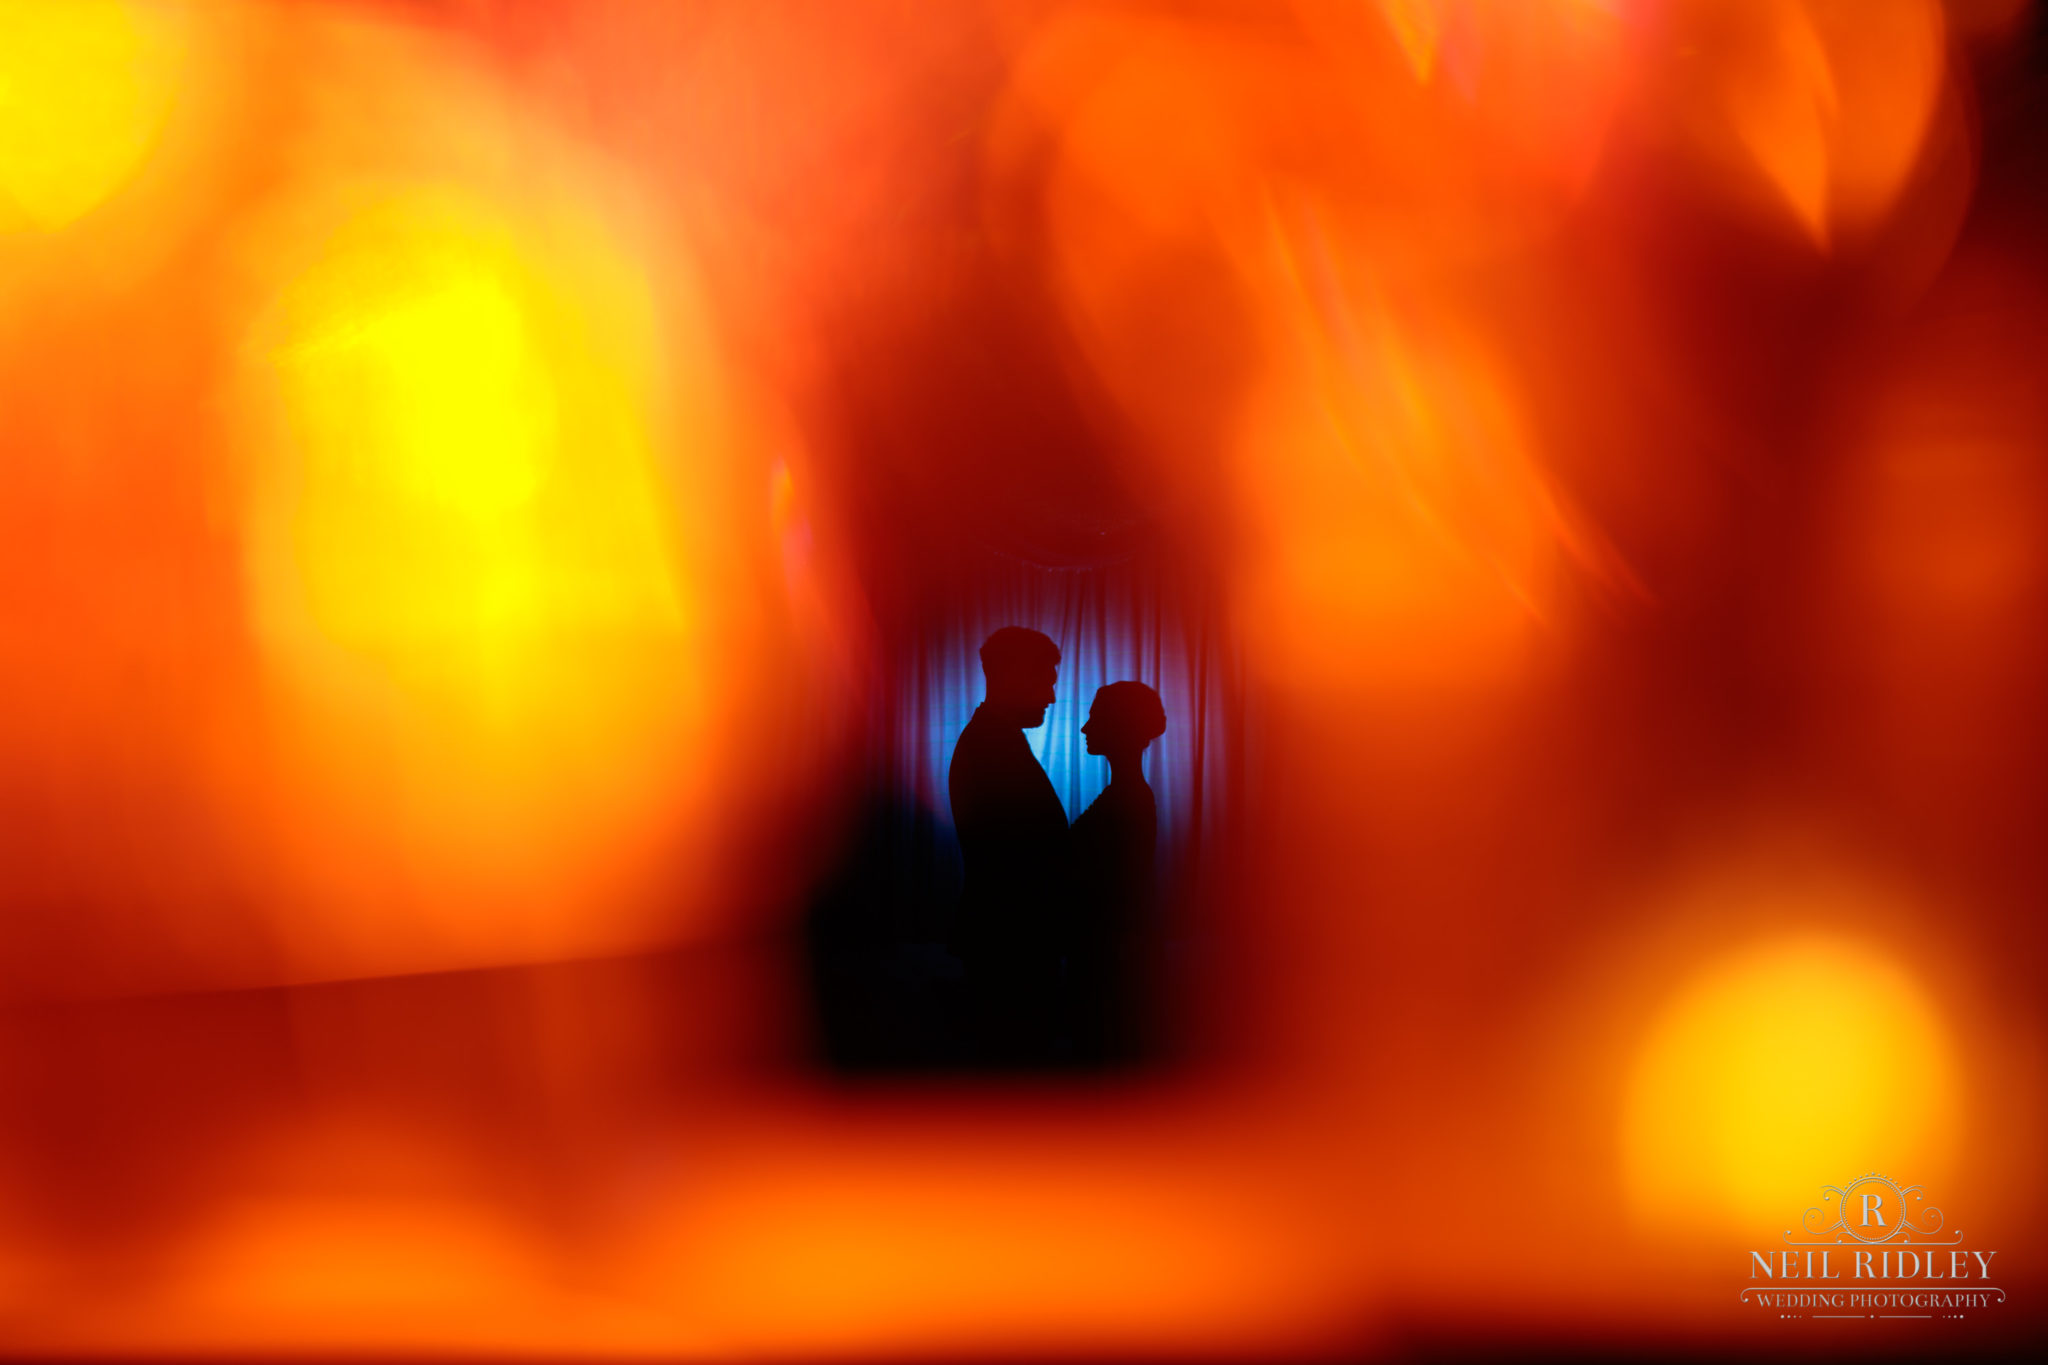 Lancashire Wedding Photographer - Bride and Groom at Eaves Hall